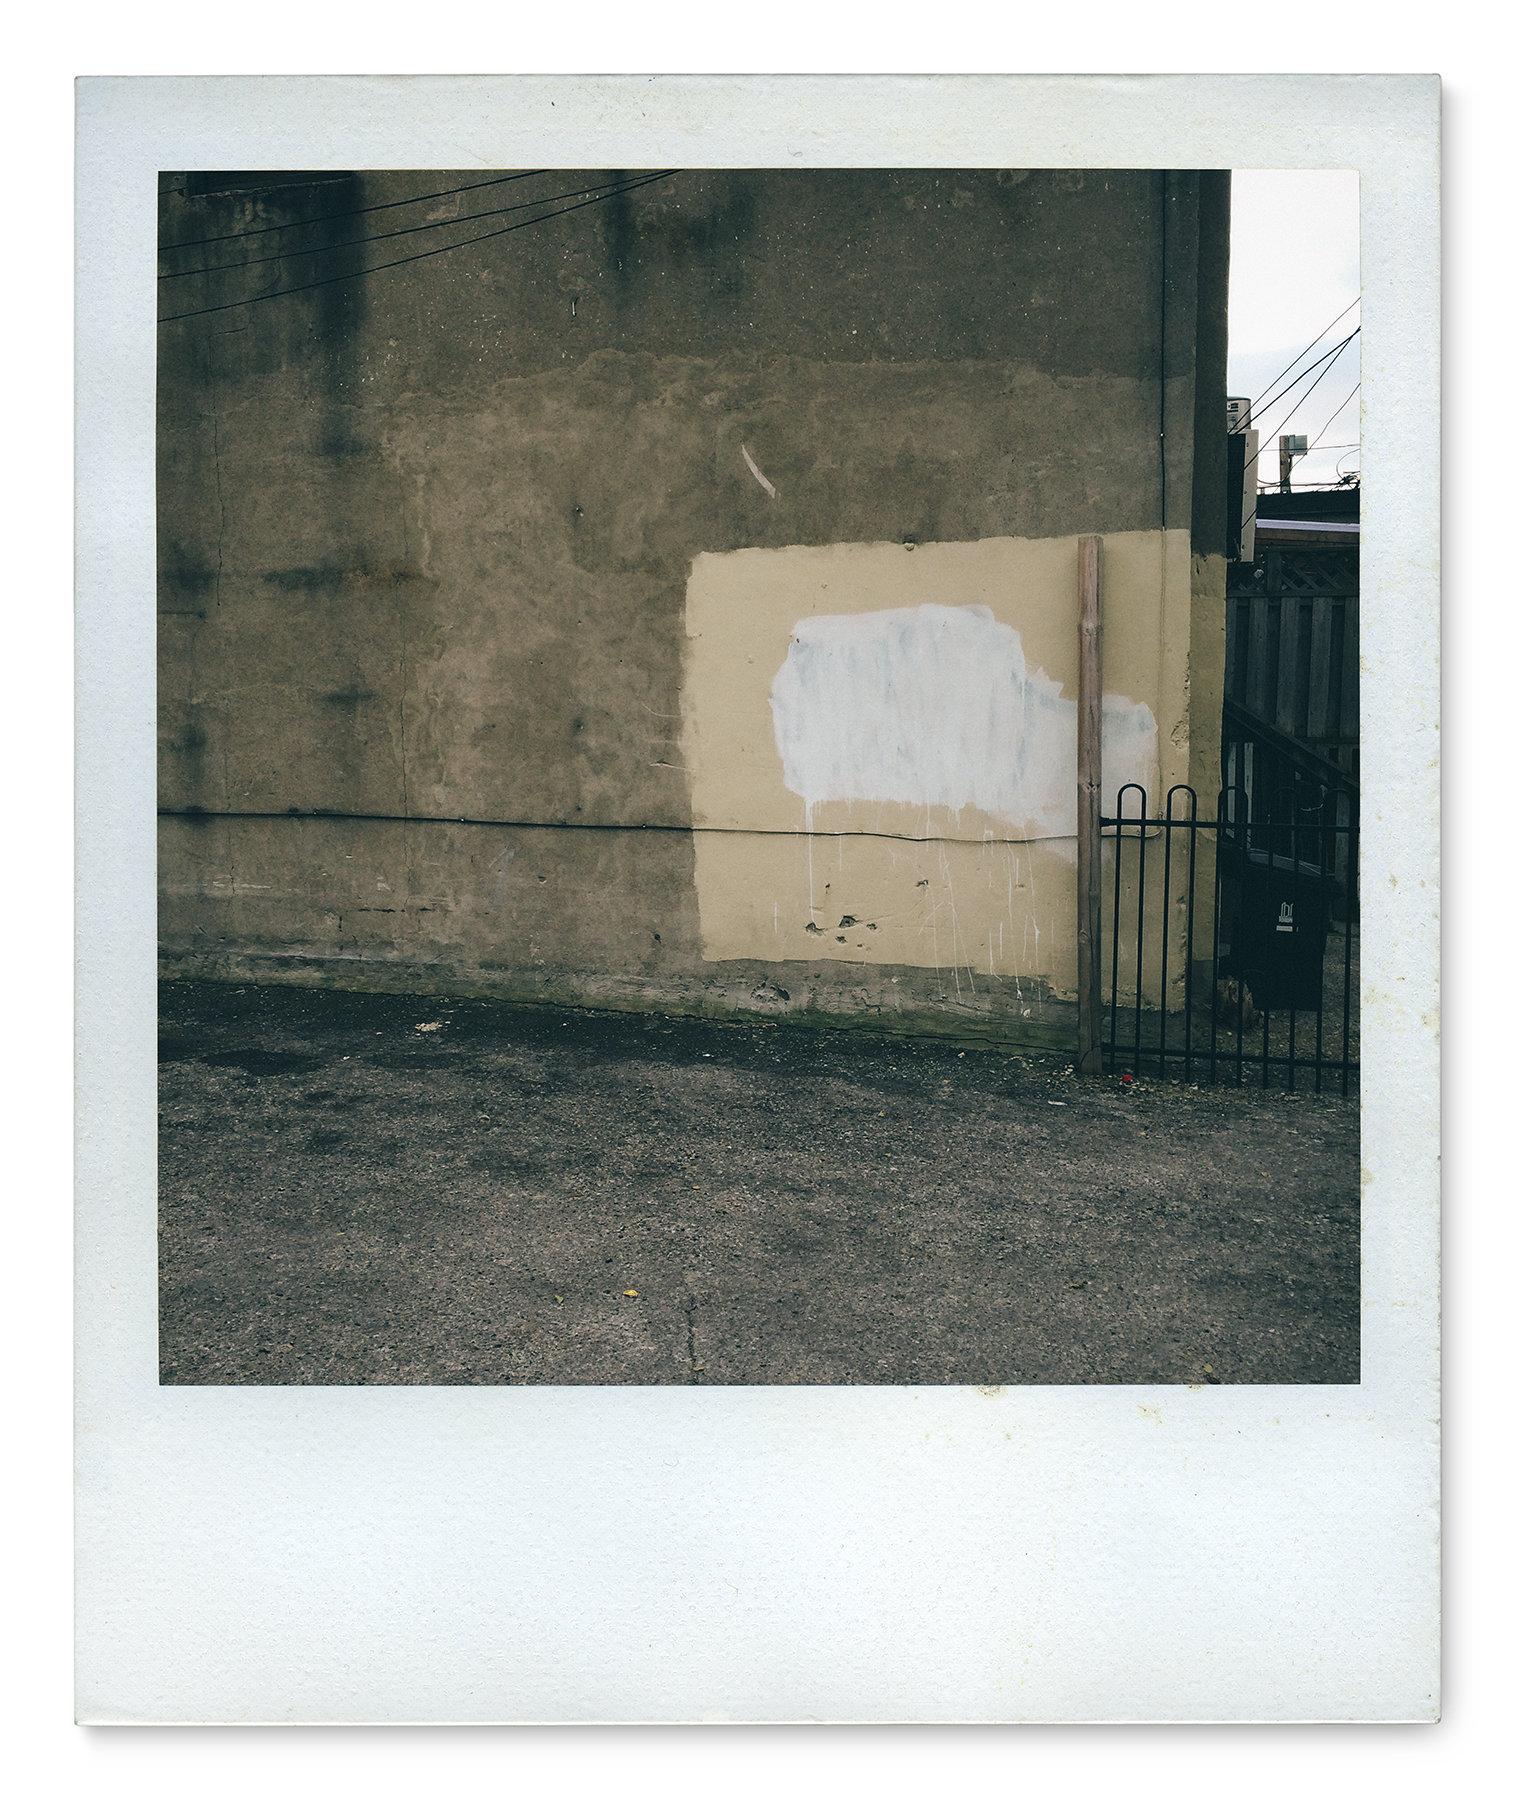 054_Polaroid SX70_IMG_1077.jpg